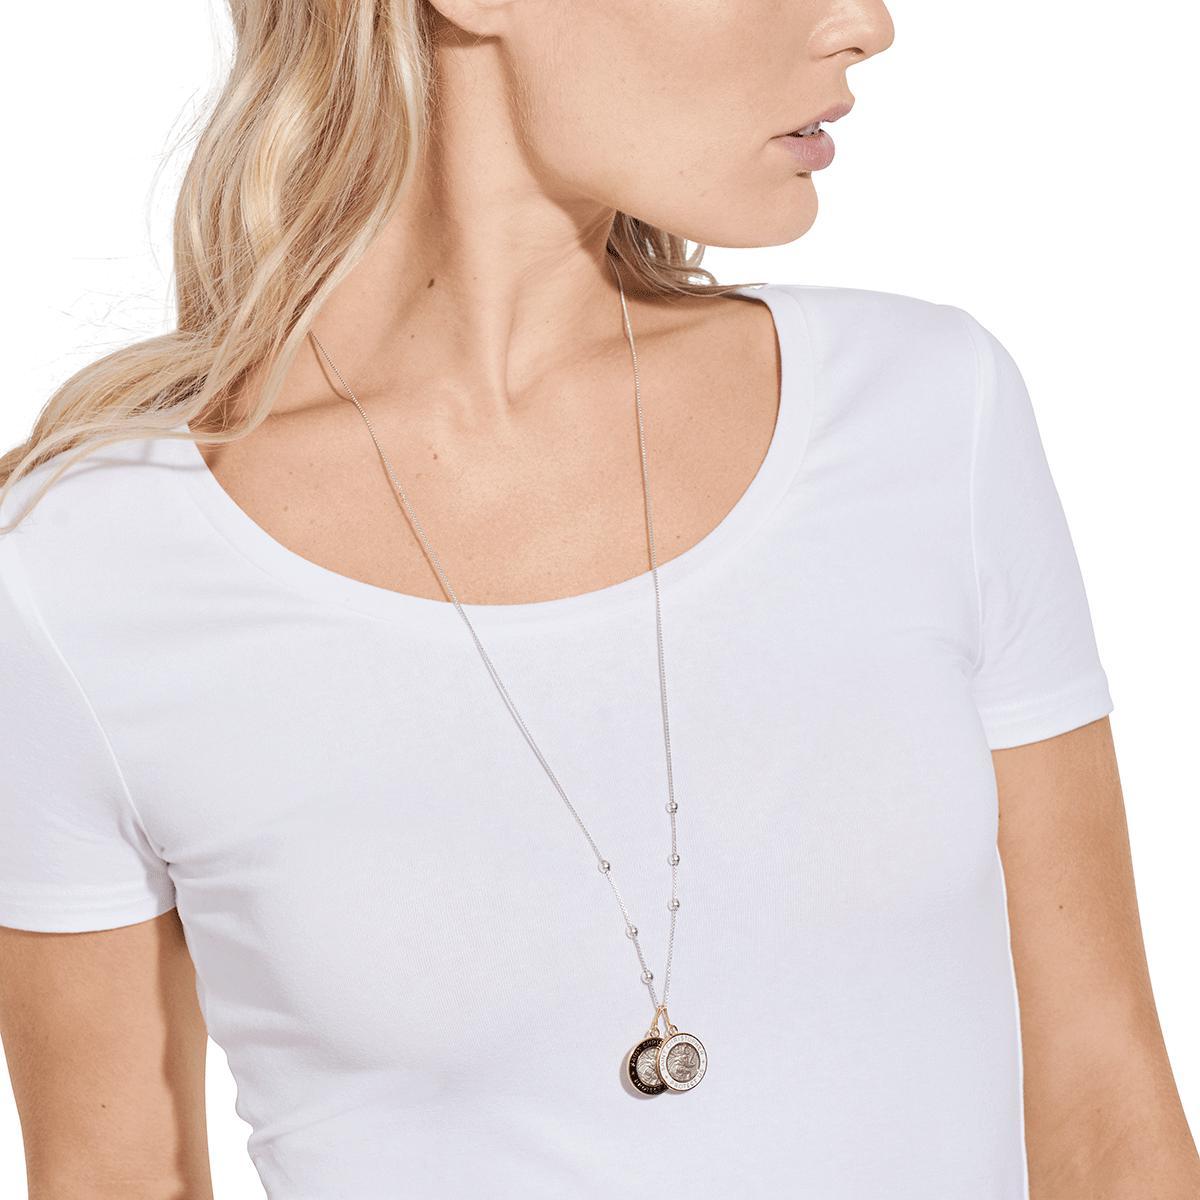 95a2e67e301 ALEX AND ANI - Metallic White Enamel Saint Christopher Necklace Charm -  Lyst. View fullscreen